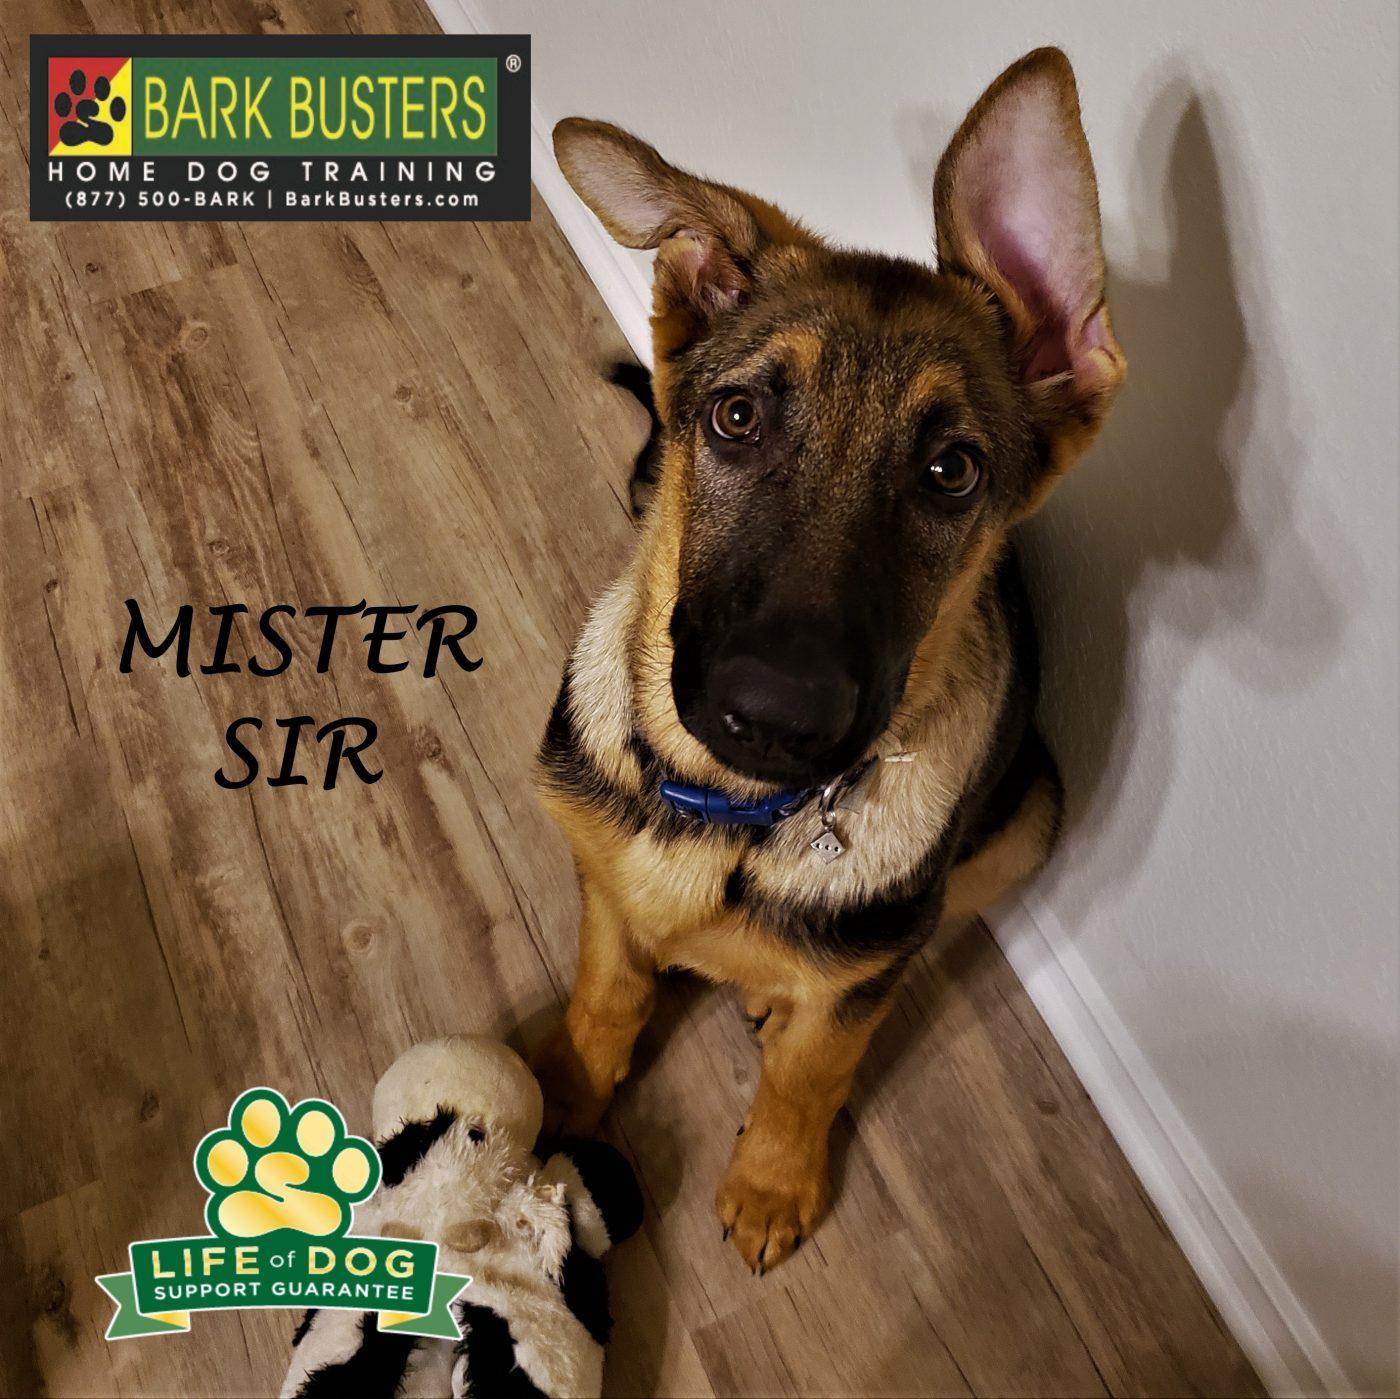 #germanshepherd #germanshepherdpuppy #puppytraining #dogtrainingjarrell #dogtrainernearme #barkbusters #speakdogchangeyourlife #inhomedogtraining